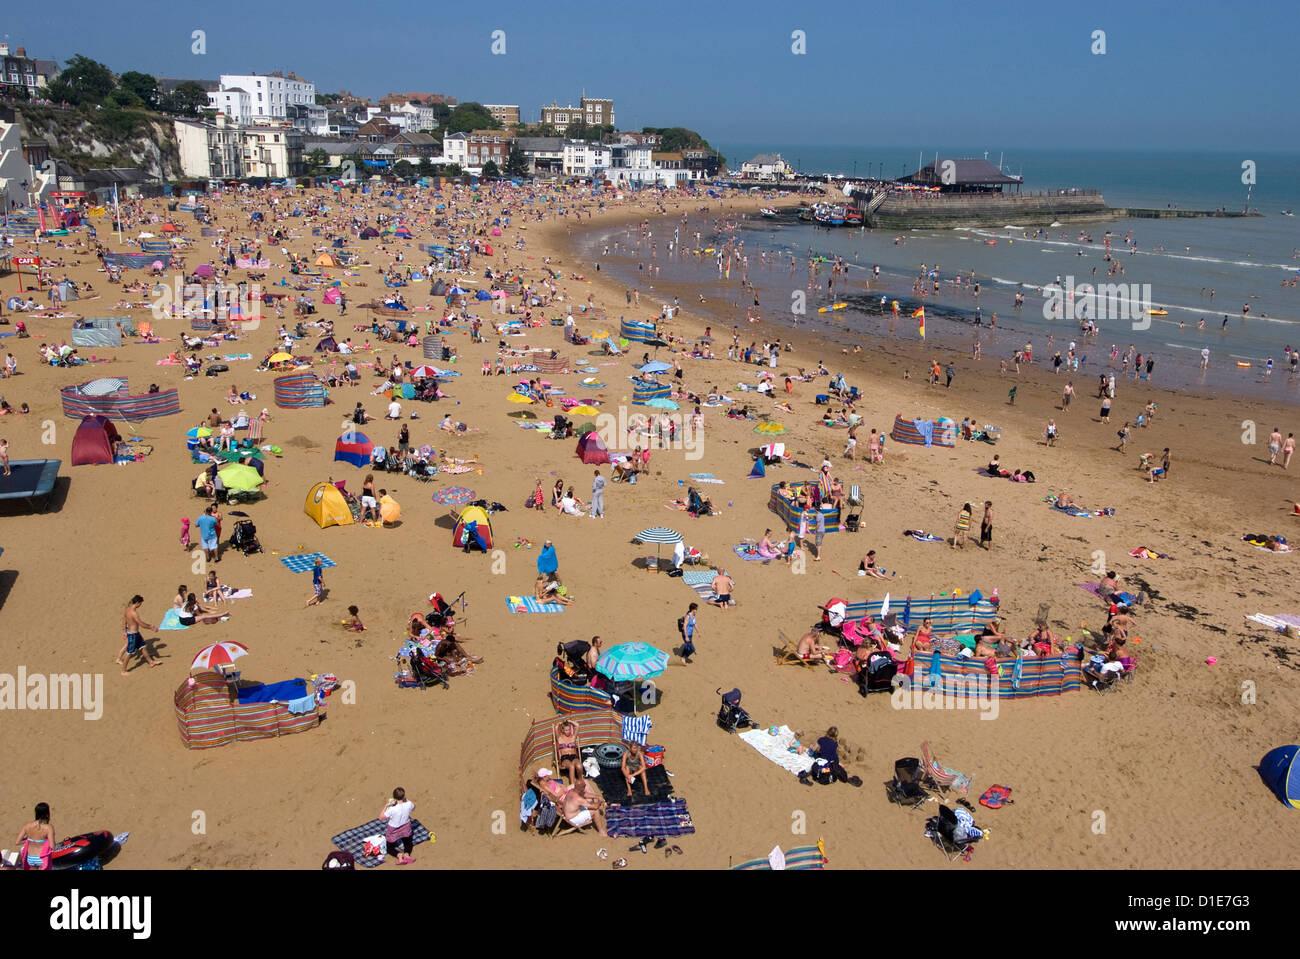 Beach, Viking Bay, Broadstairs, Kent, England, United Kingdom, Europe - Stock Image